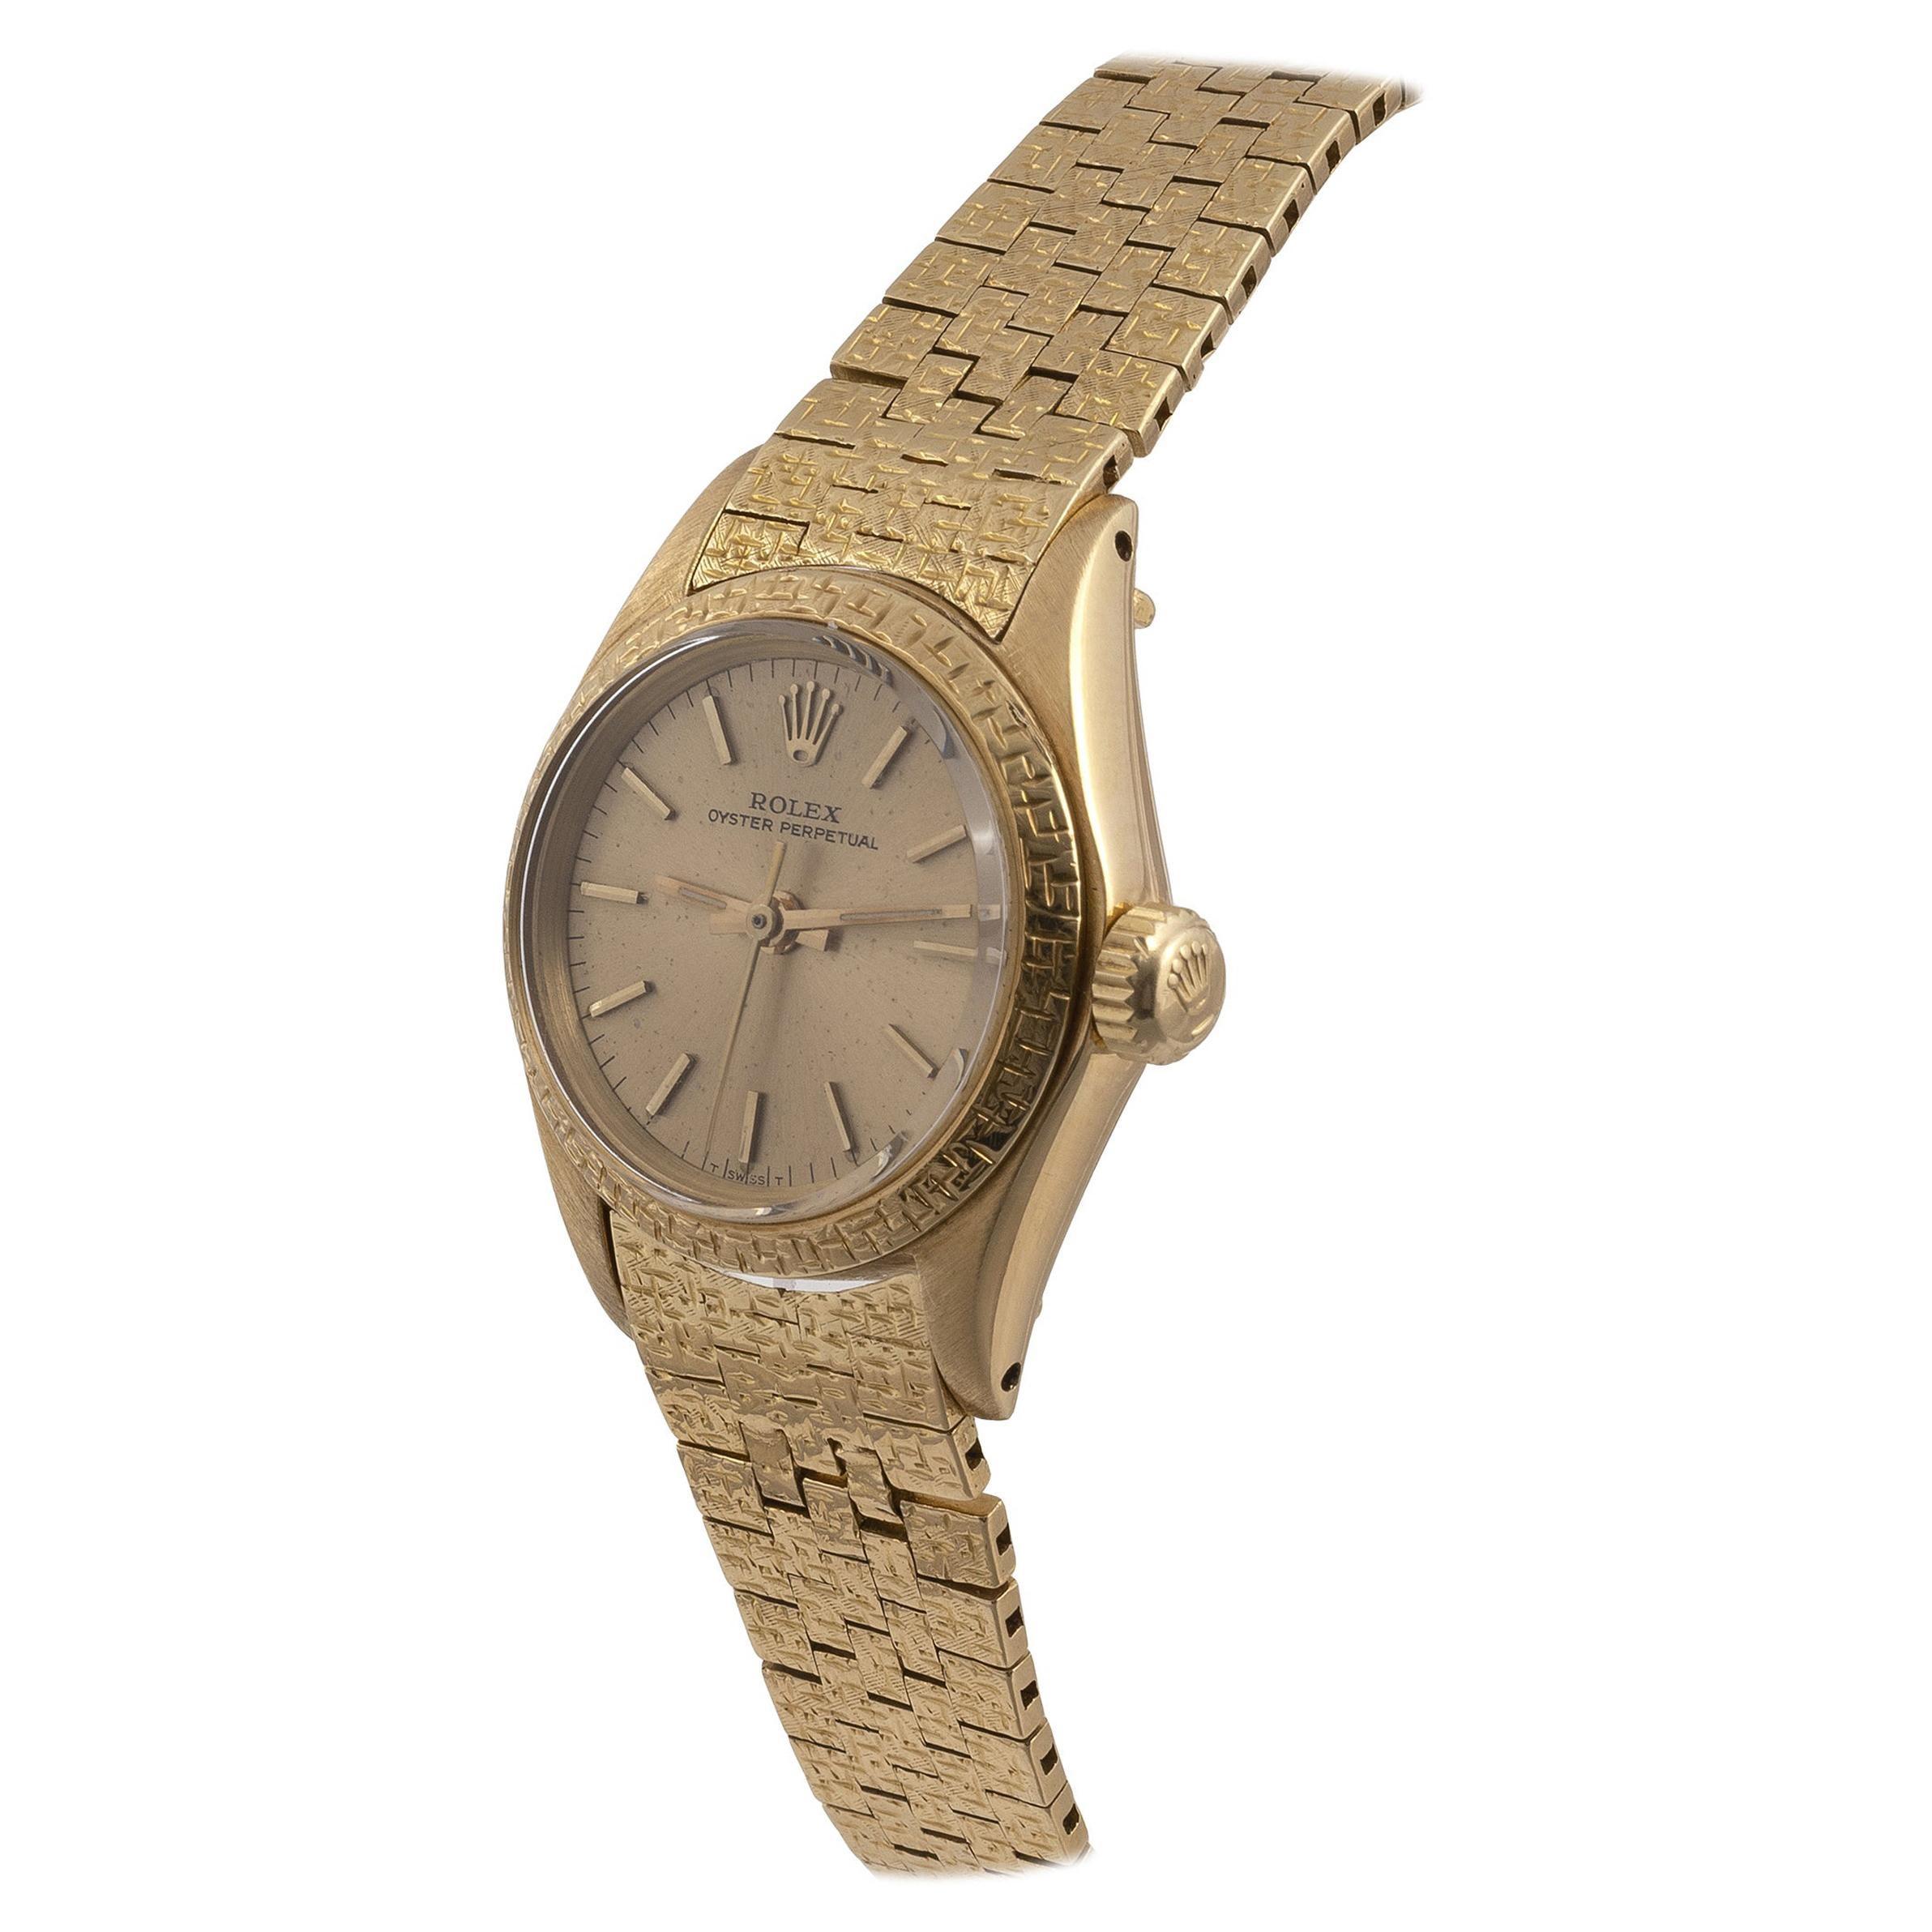 Rolex A Lady's 18ct Gold Automatic Wristwatch